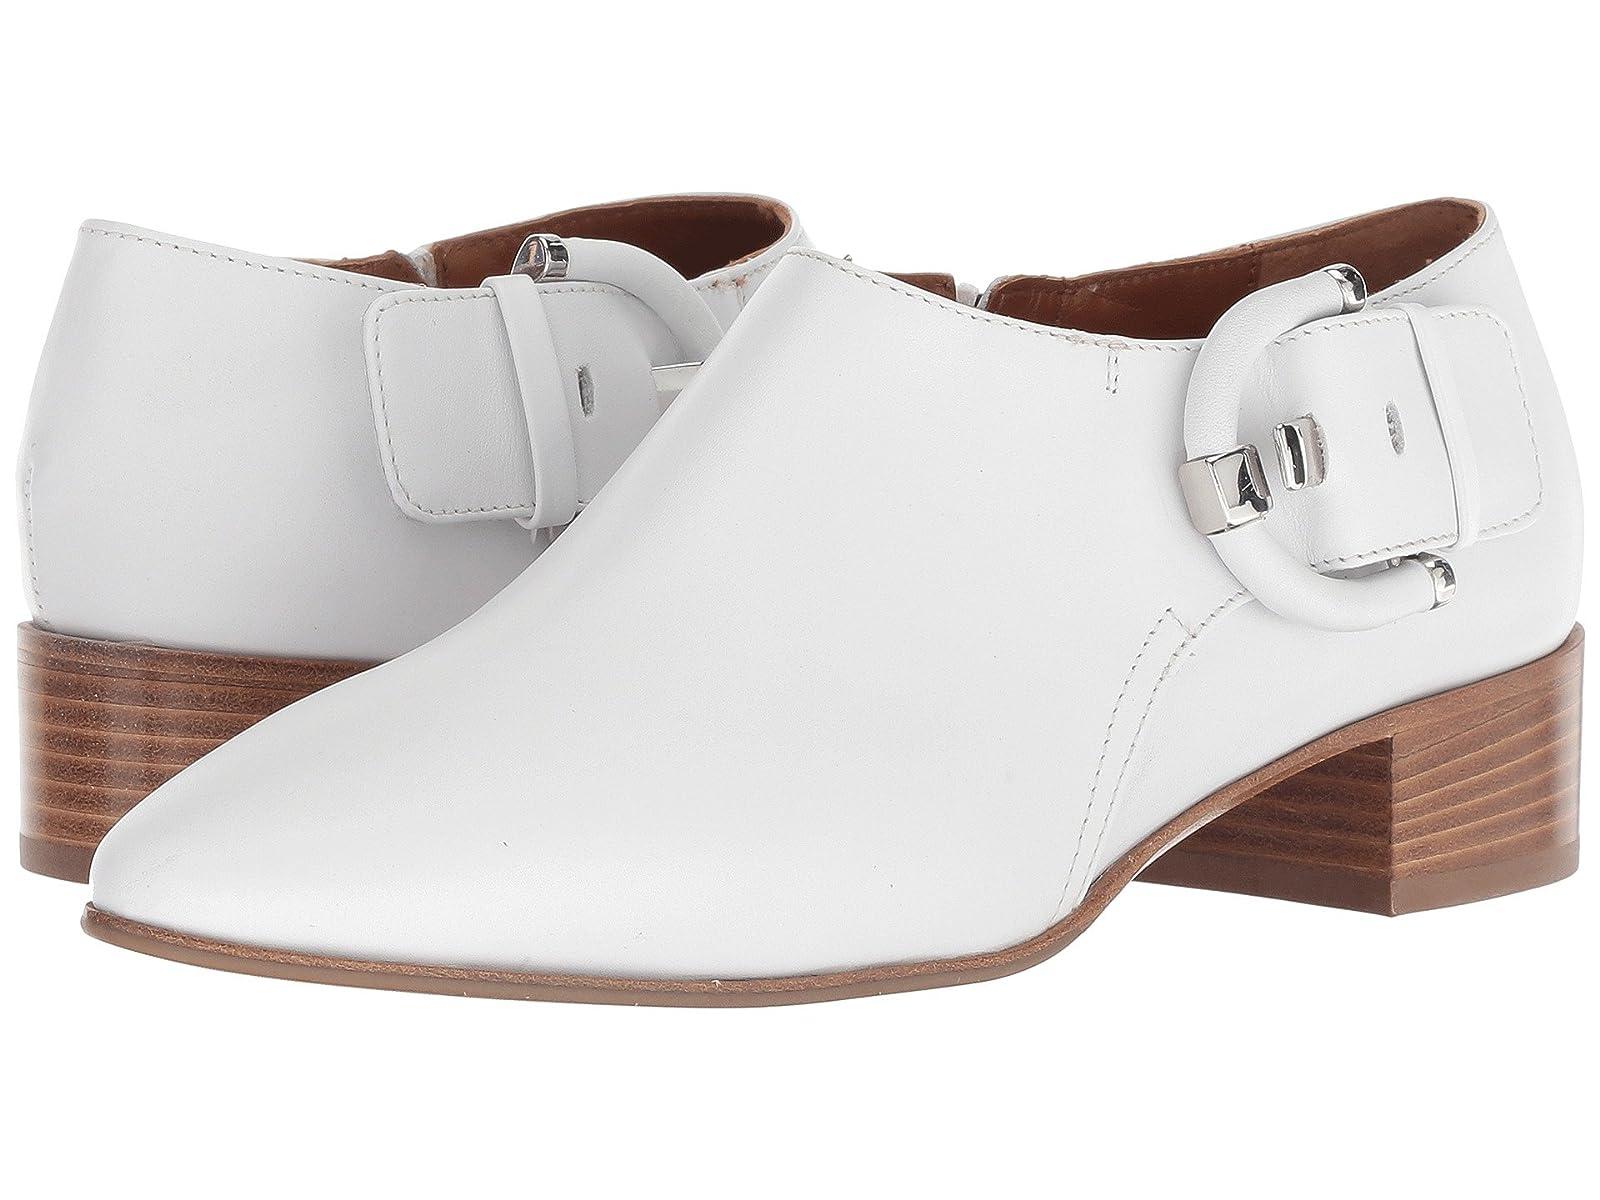 Aquatalia FerryAtmospheric grades have affordable shoes